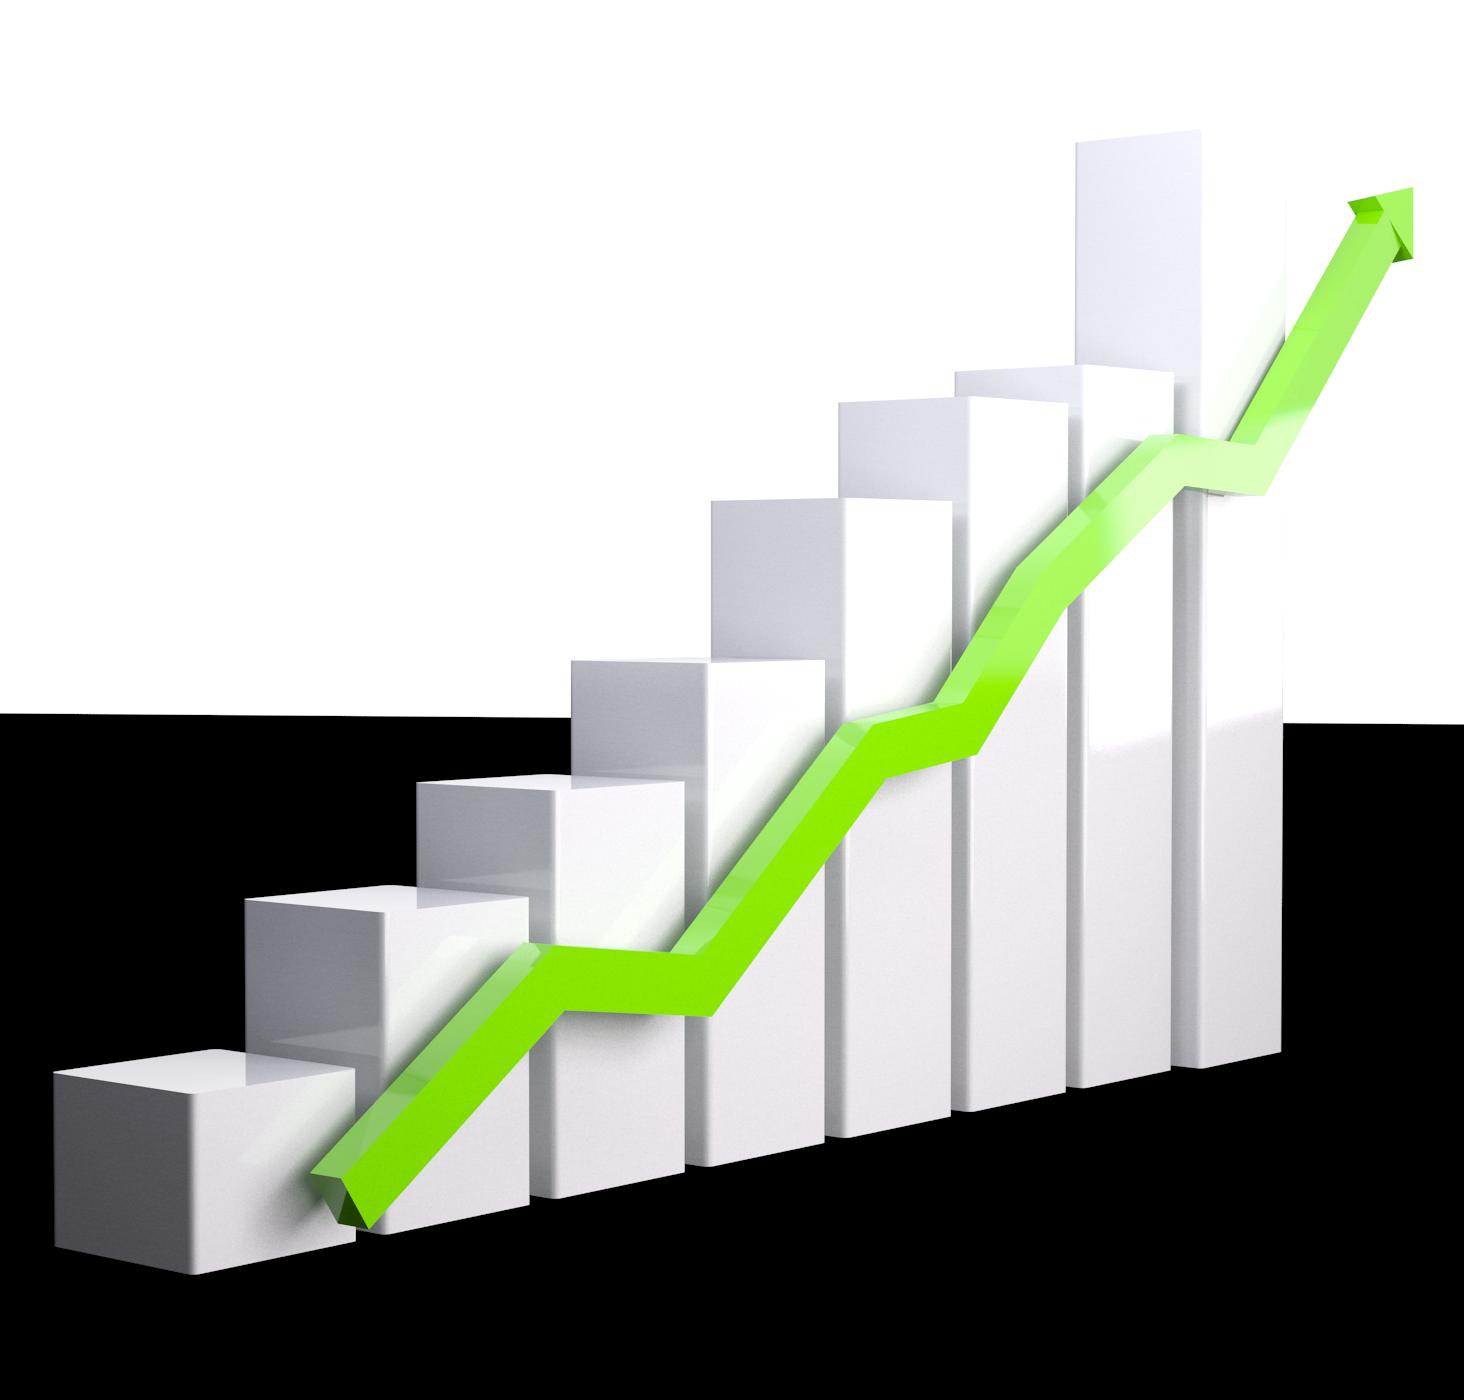 FoodXLerator growth